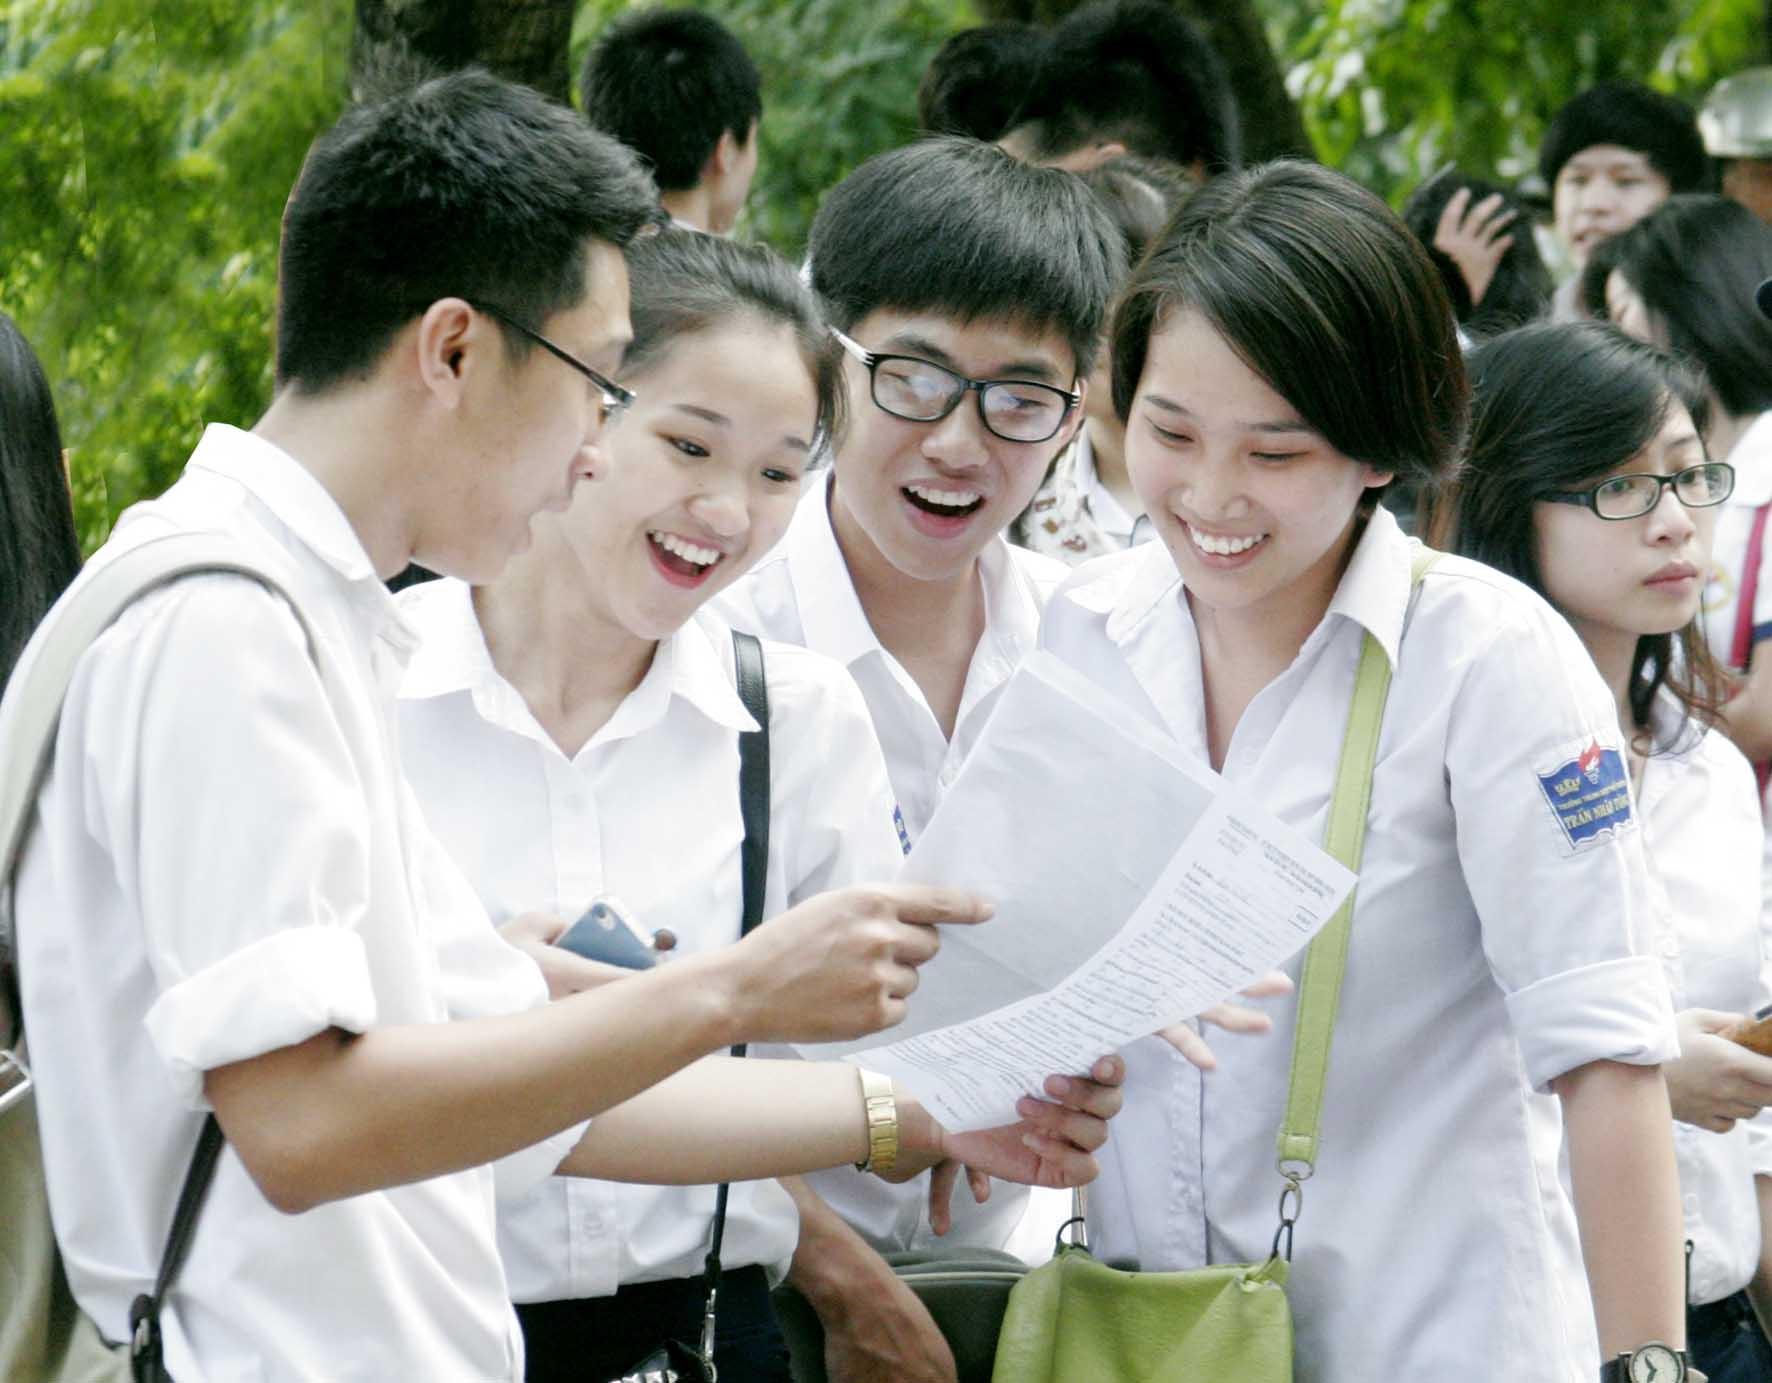 Lao-dau-vao-hoc-ma-khong-biet-nhung-dieu-nay-that-uong-phi-2k1-a